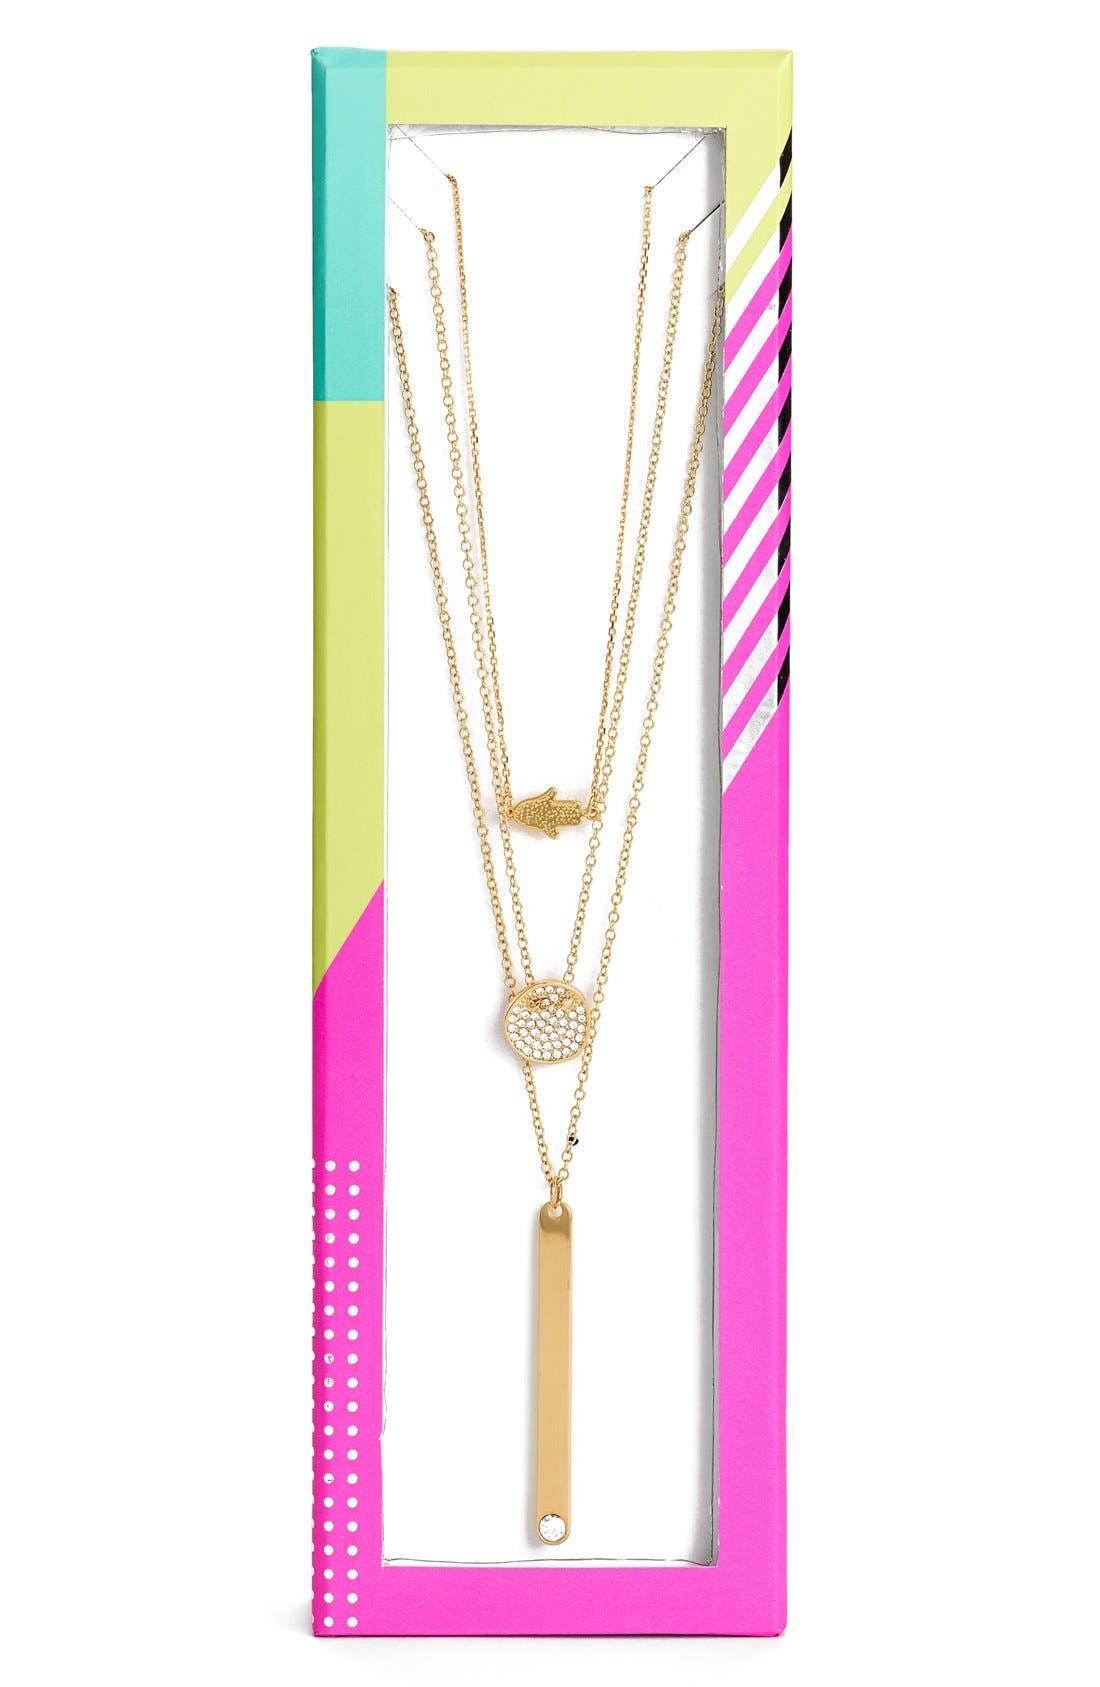 'Modern Metallics' 14k-Gold Plate Layered Necklace,                             Alternate thumbnail 2, color,